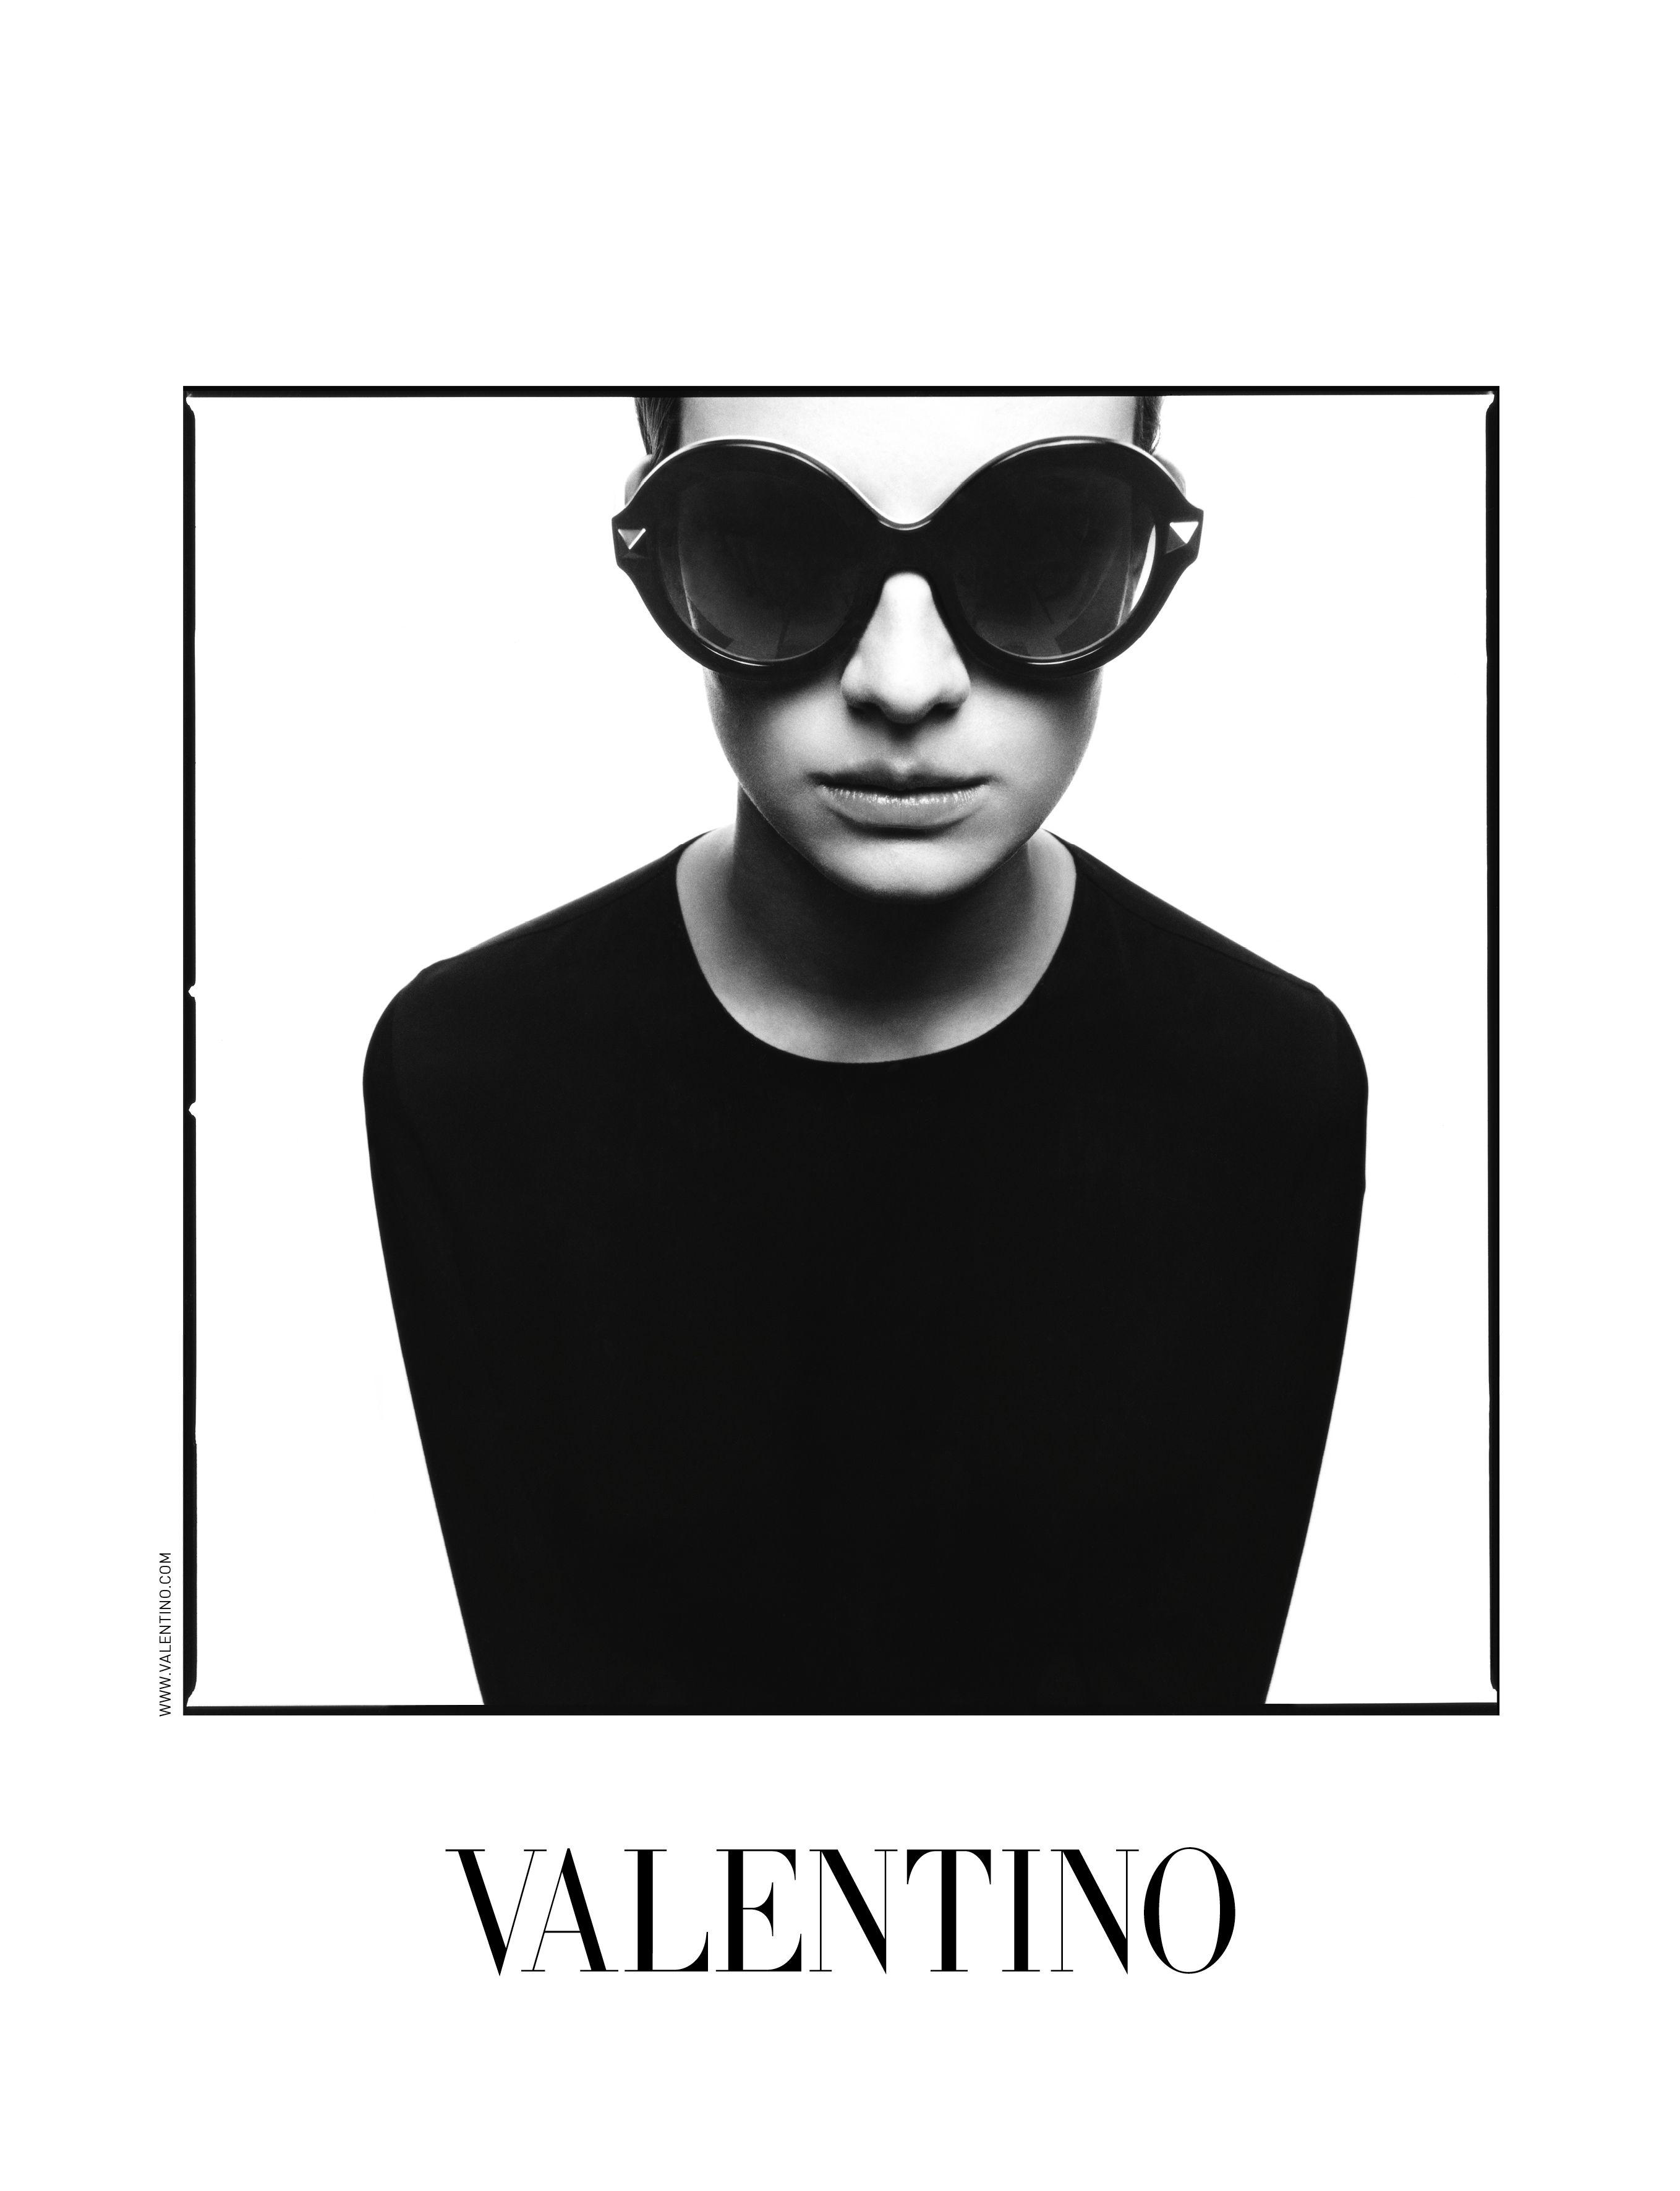 Valentino sunglasses 636dece4c9d